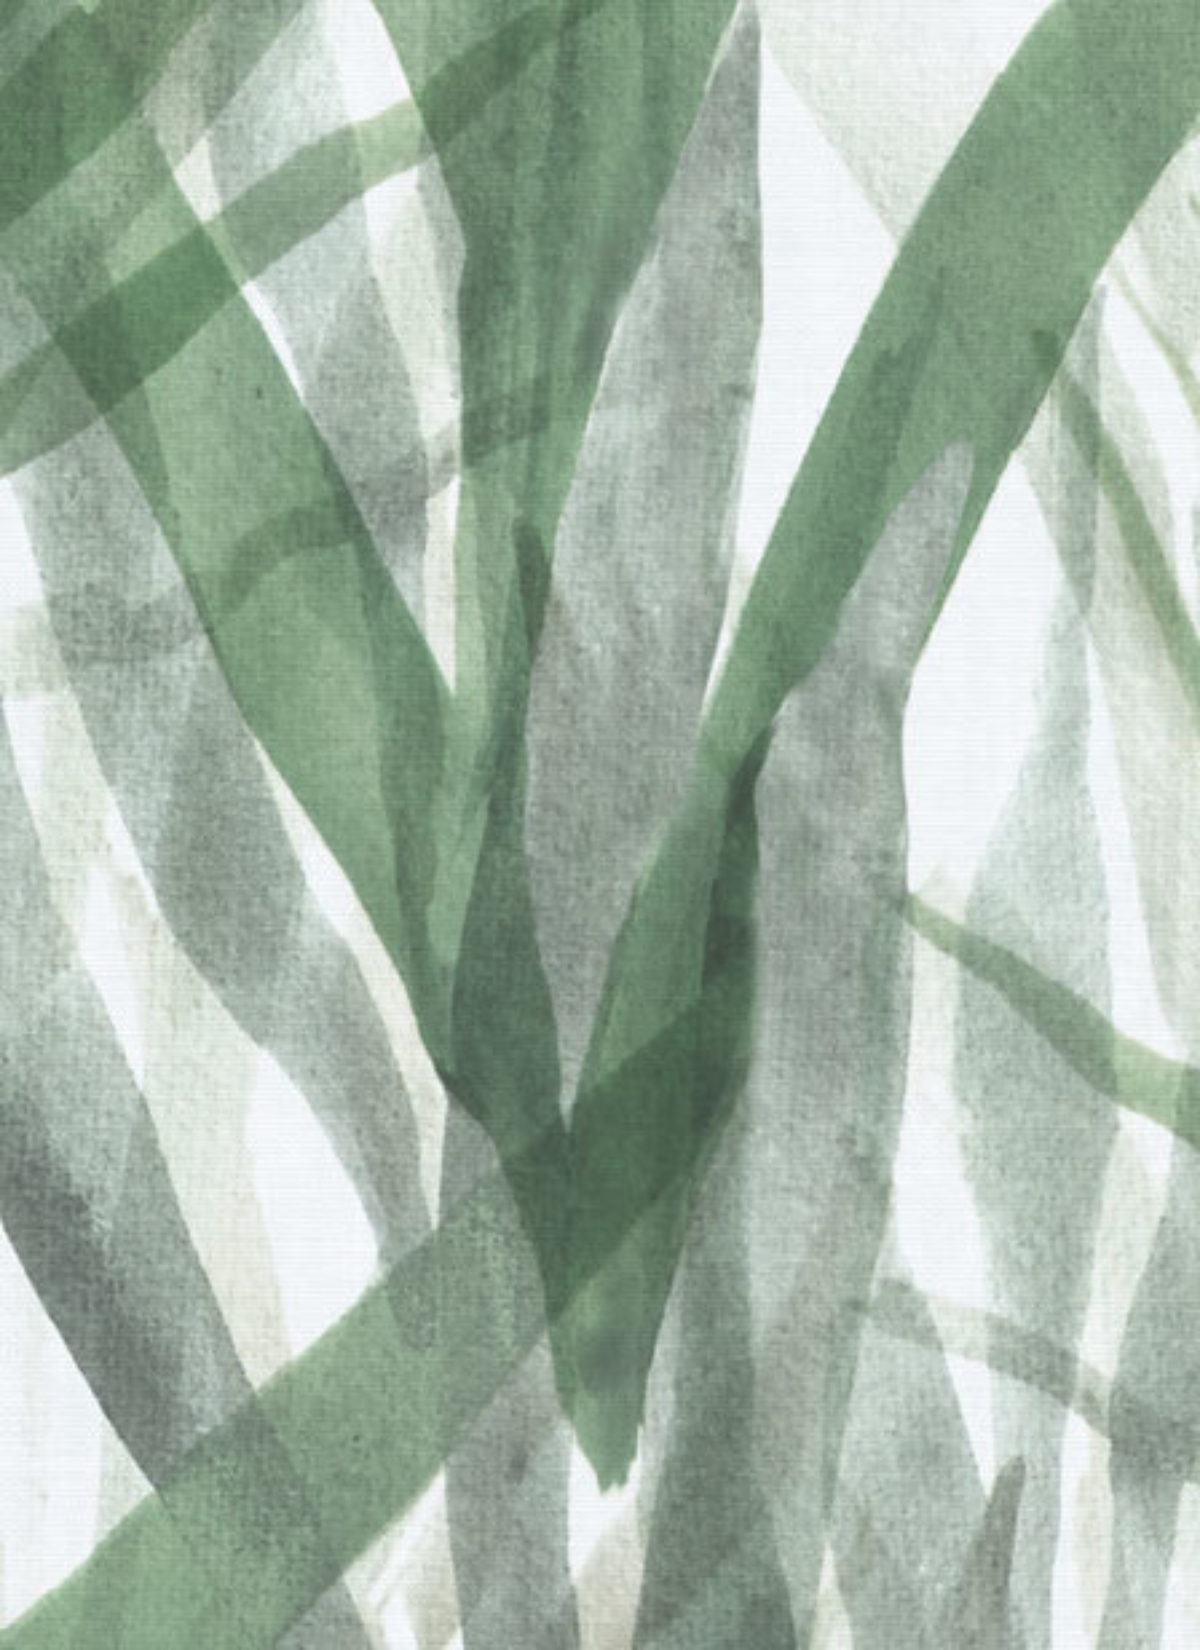 Kendix gordijnen in between vitrage stoffen collectie 0119440018 botanical grass t 18 zoom